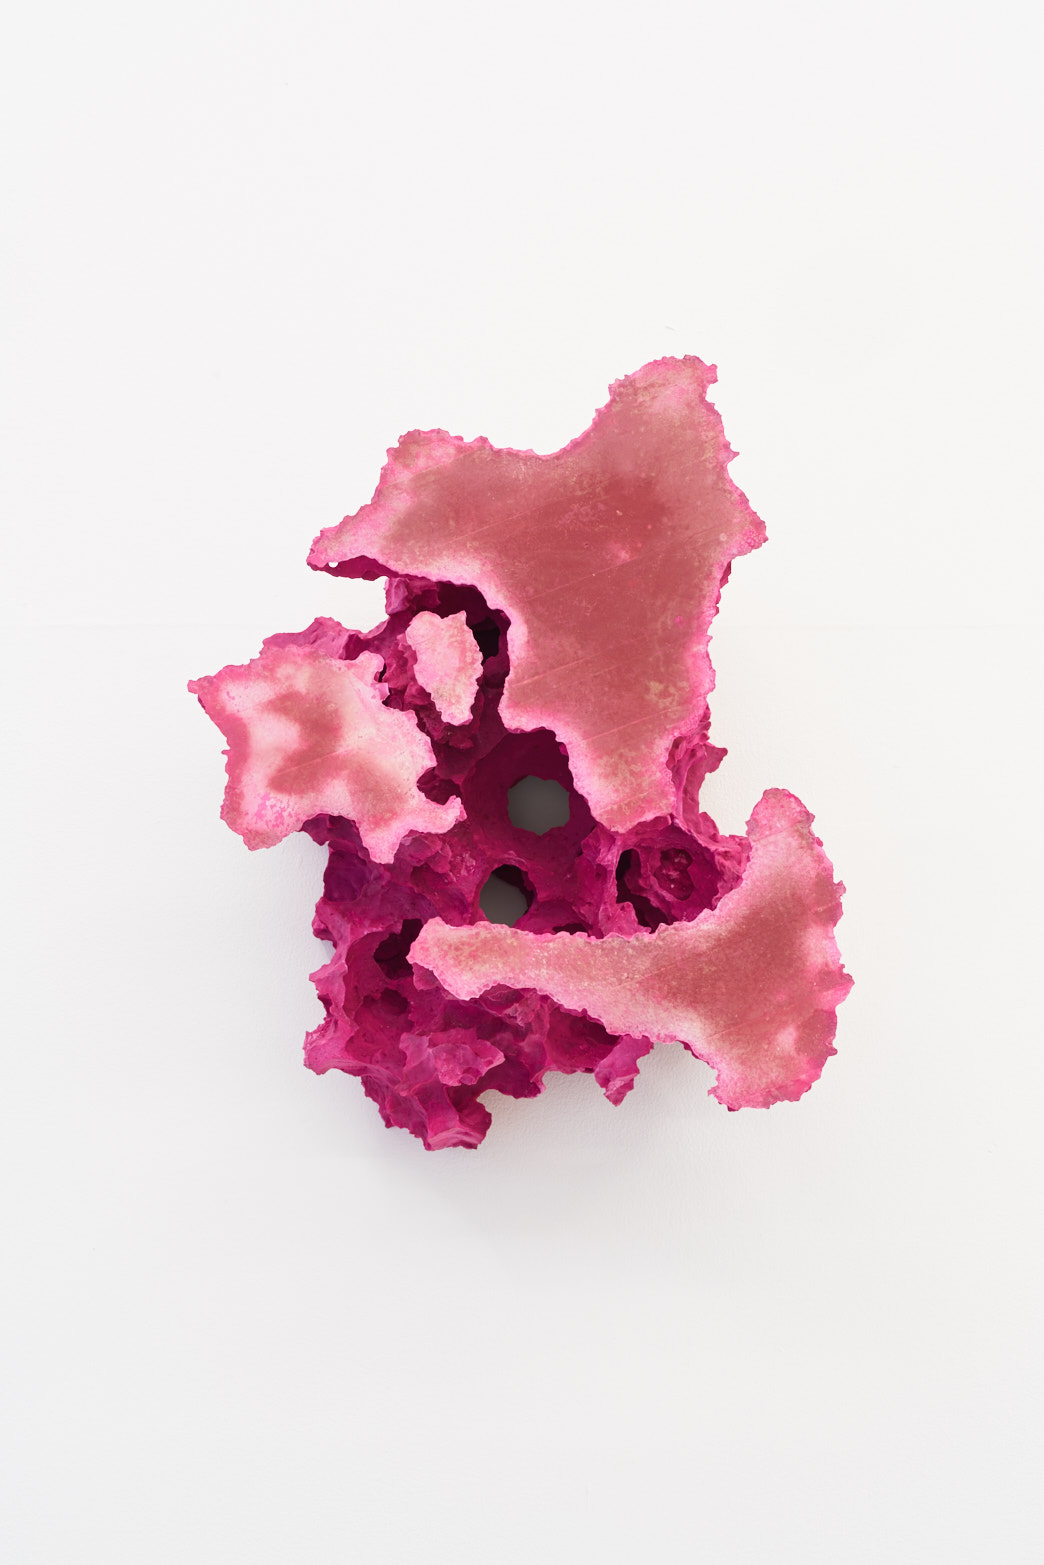 Florian Roithmayr, forma no. 21, plaster, pigments, 2018, Tenderpixel